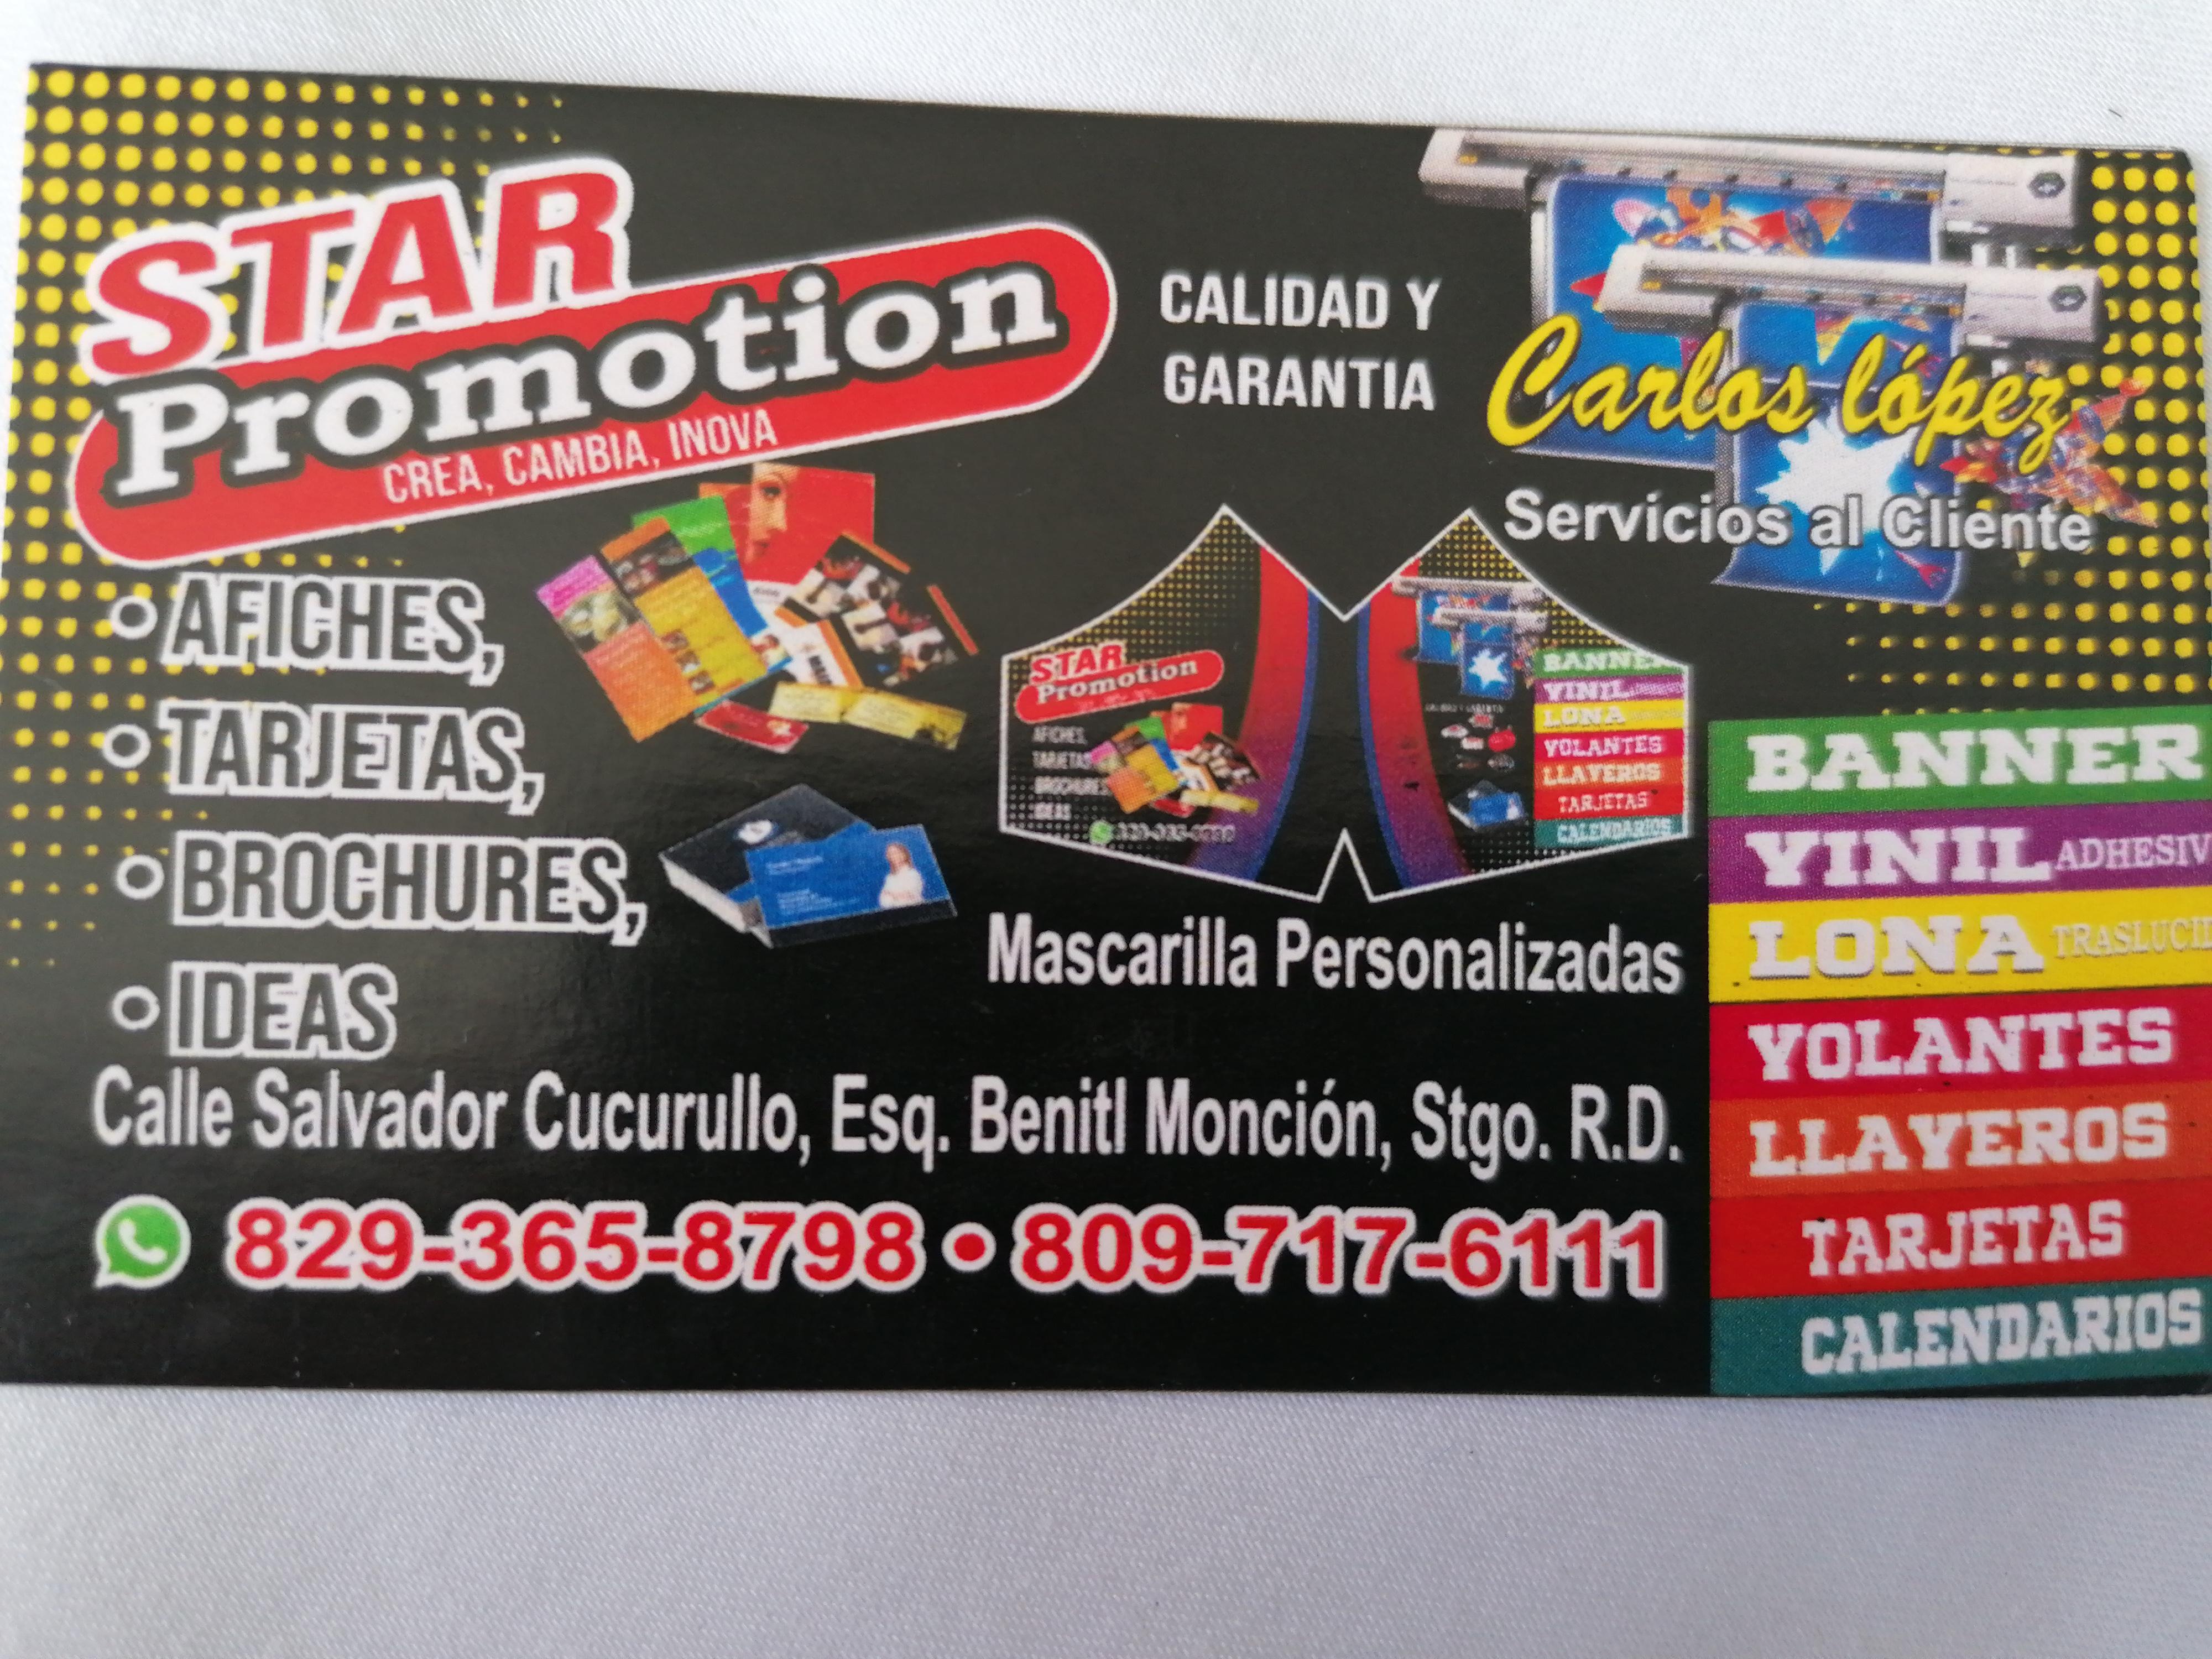 Start Promotion